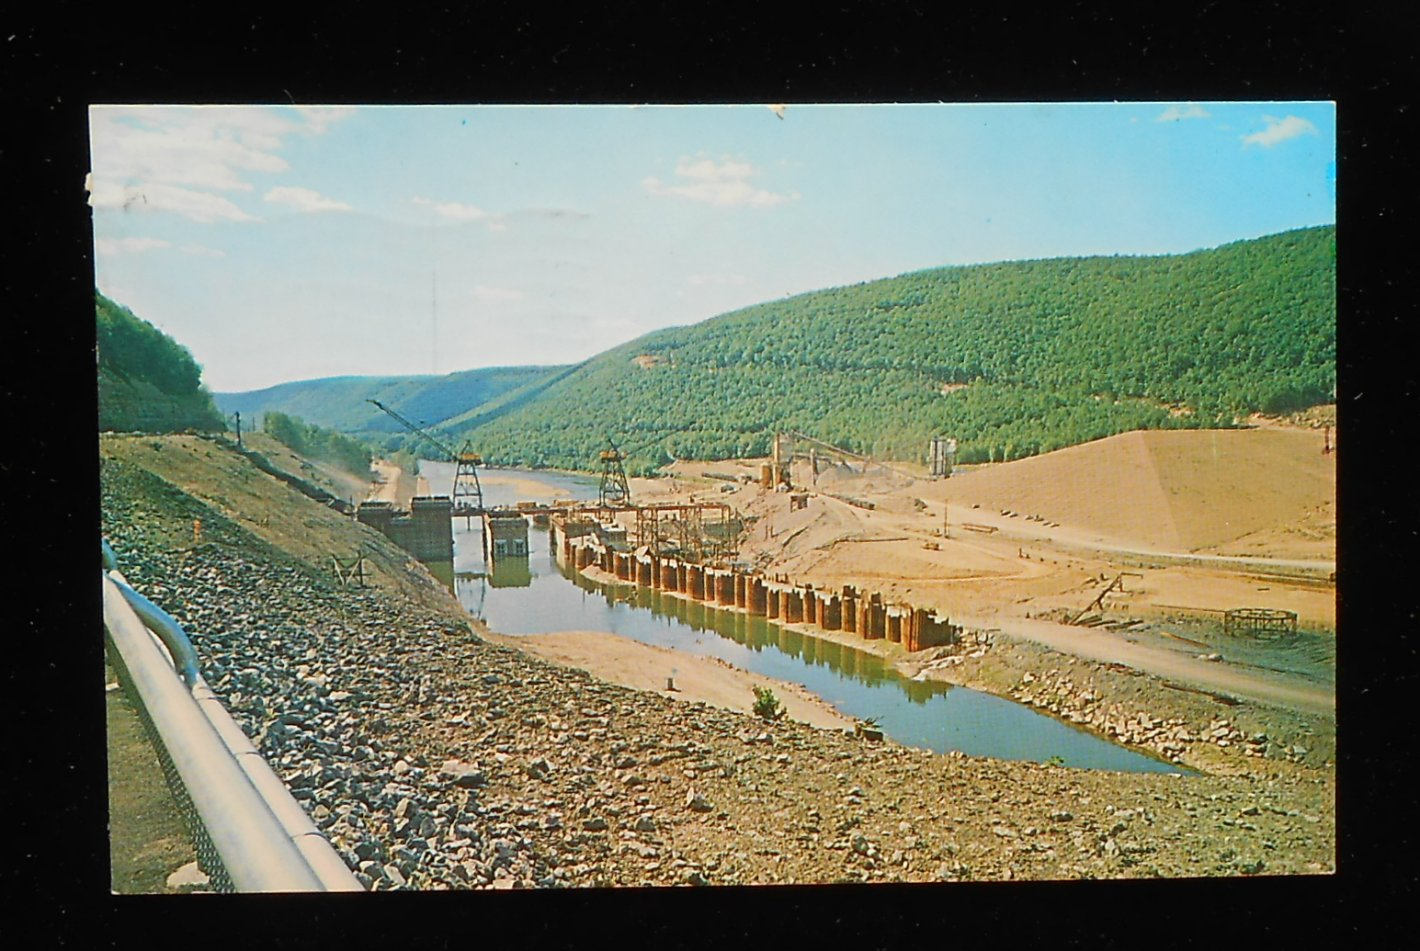 Kinzua Dam in the Allegheny Forest - YouTube